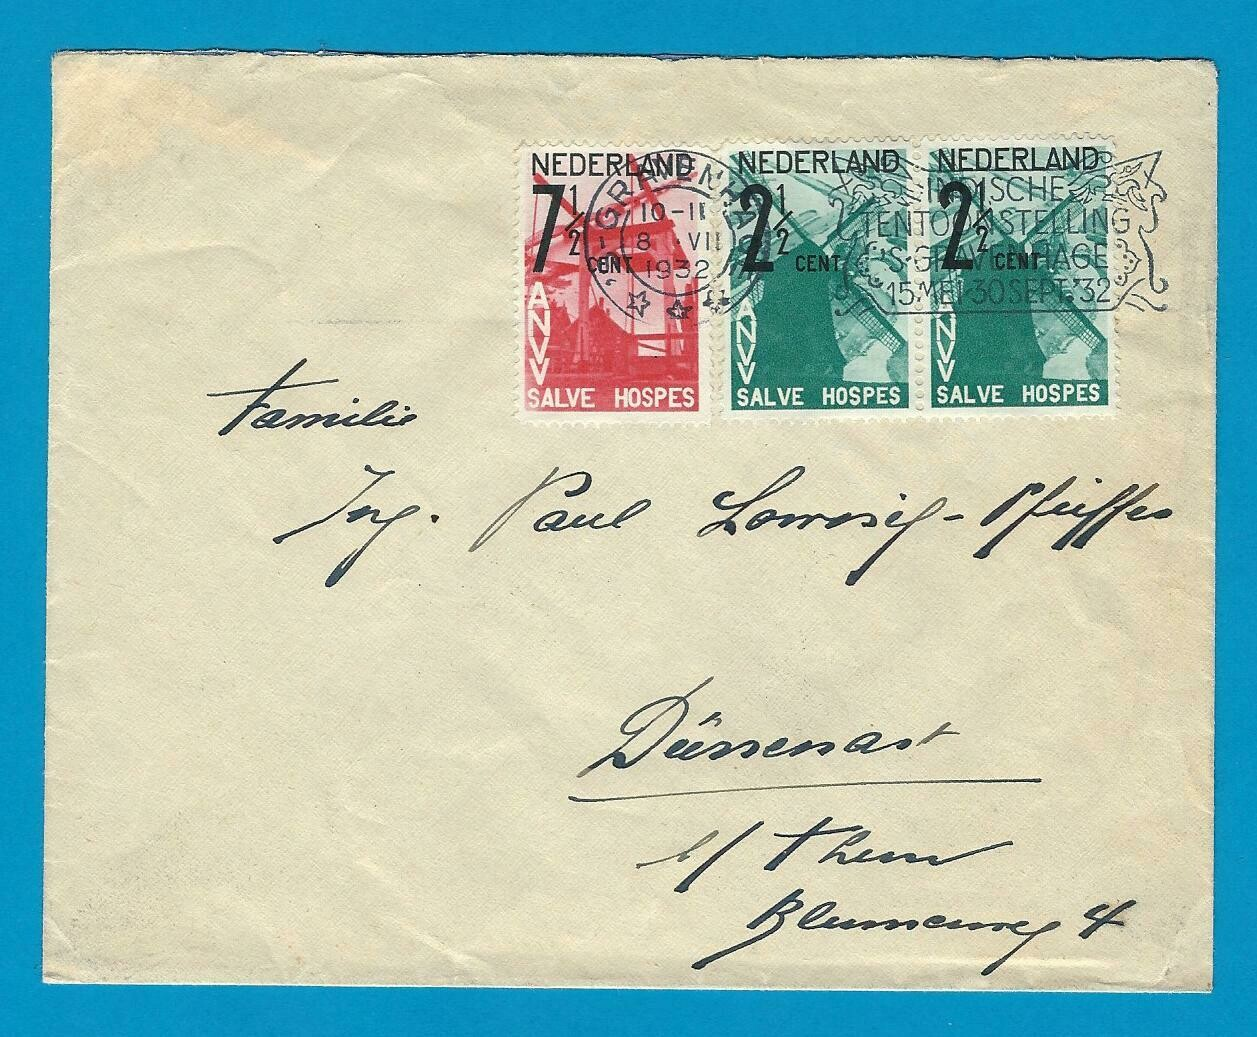 NEDERLAND brief 1932 Den Haag ANVV